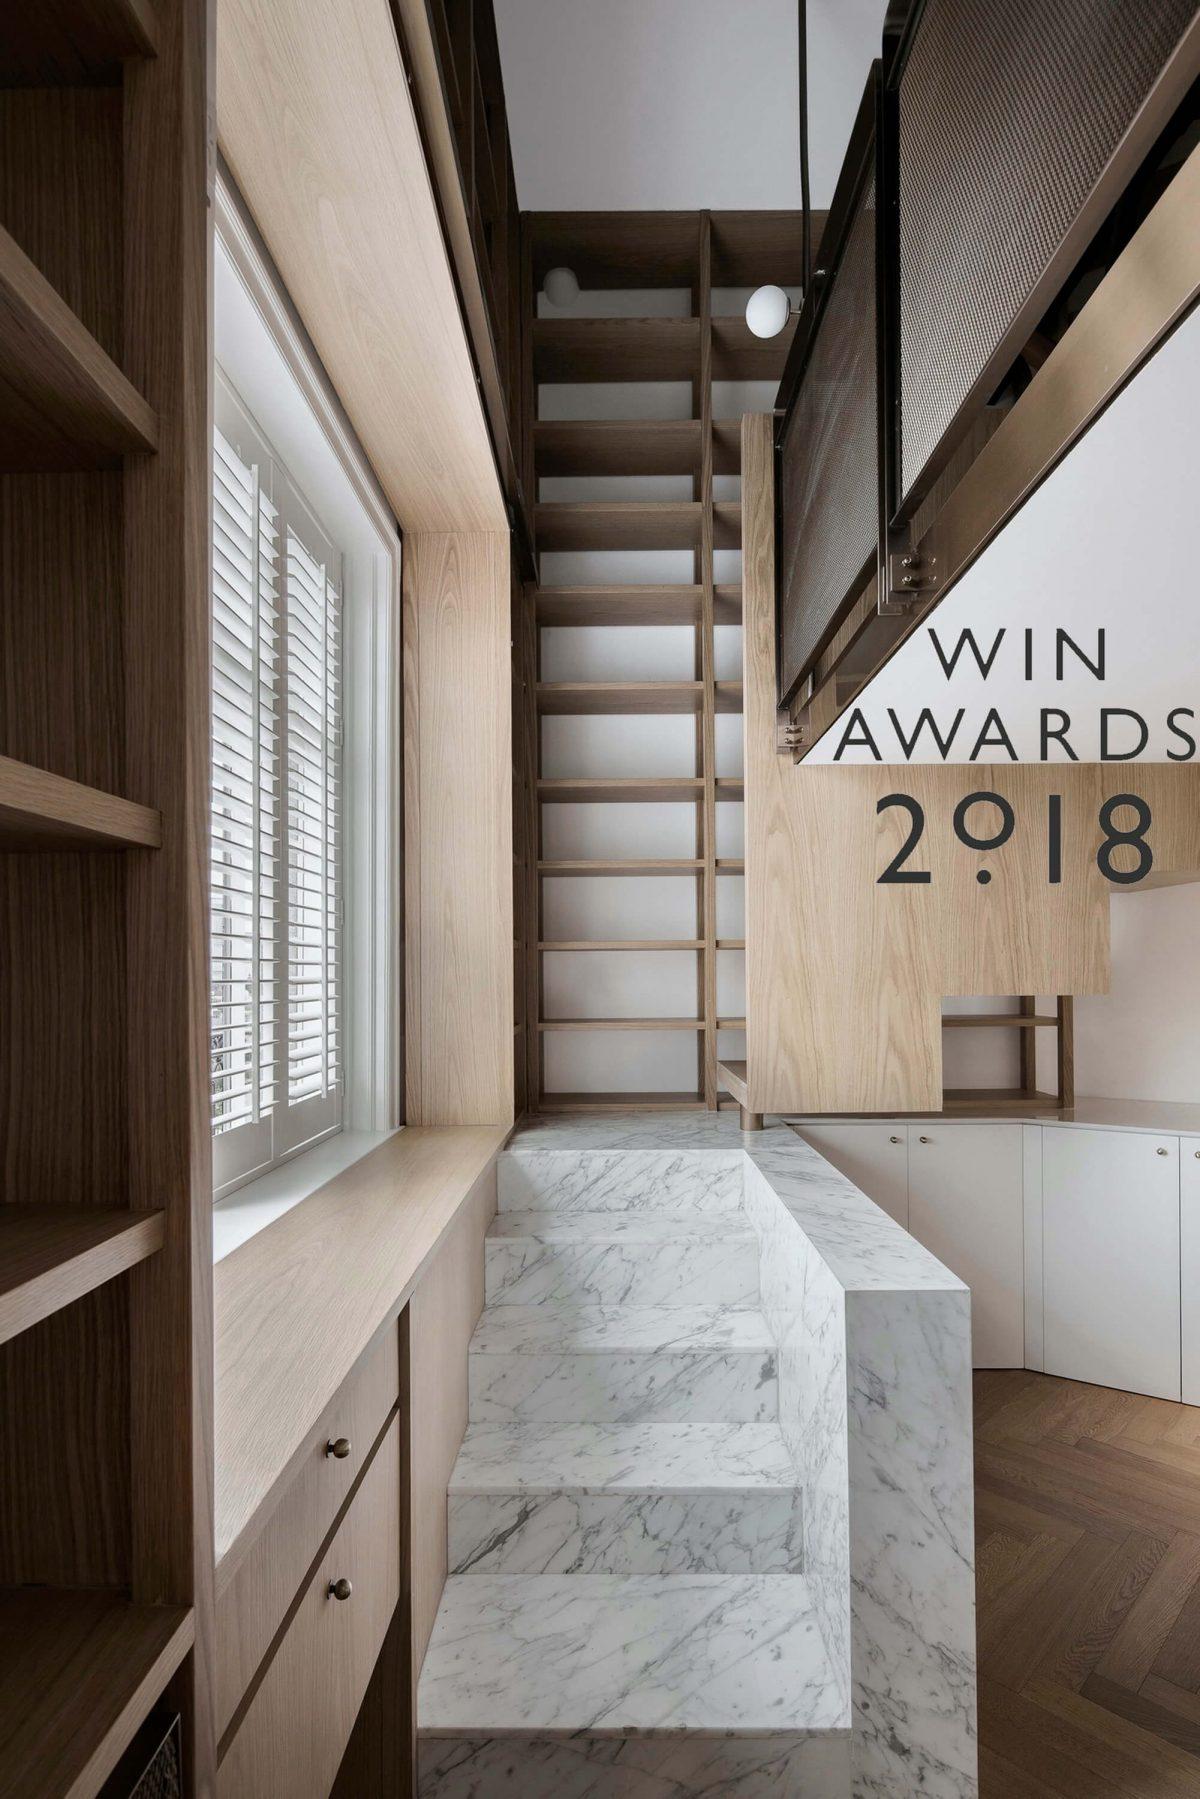 WIN Awards 2018 - world interiors news awards 2018